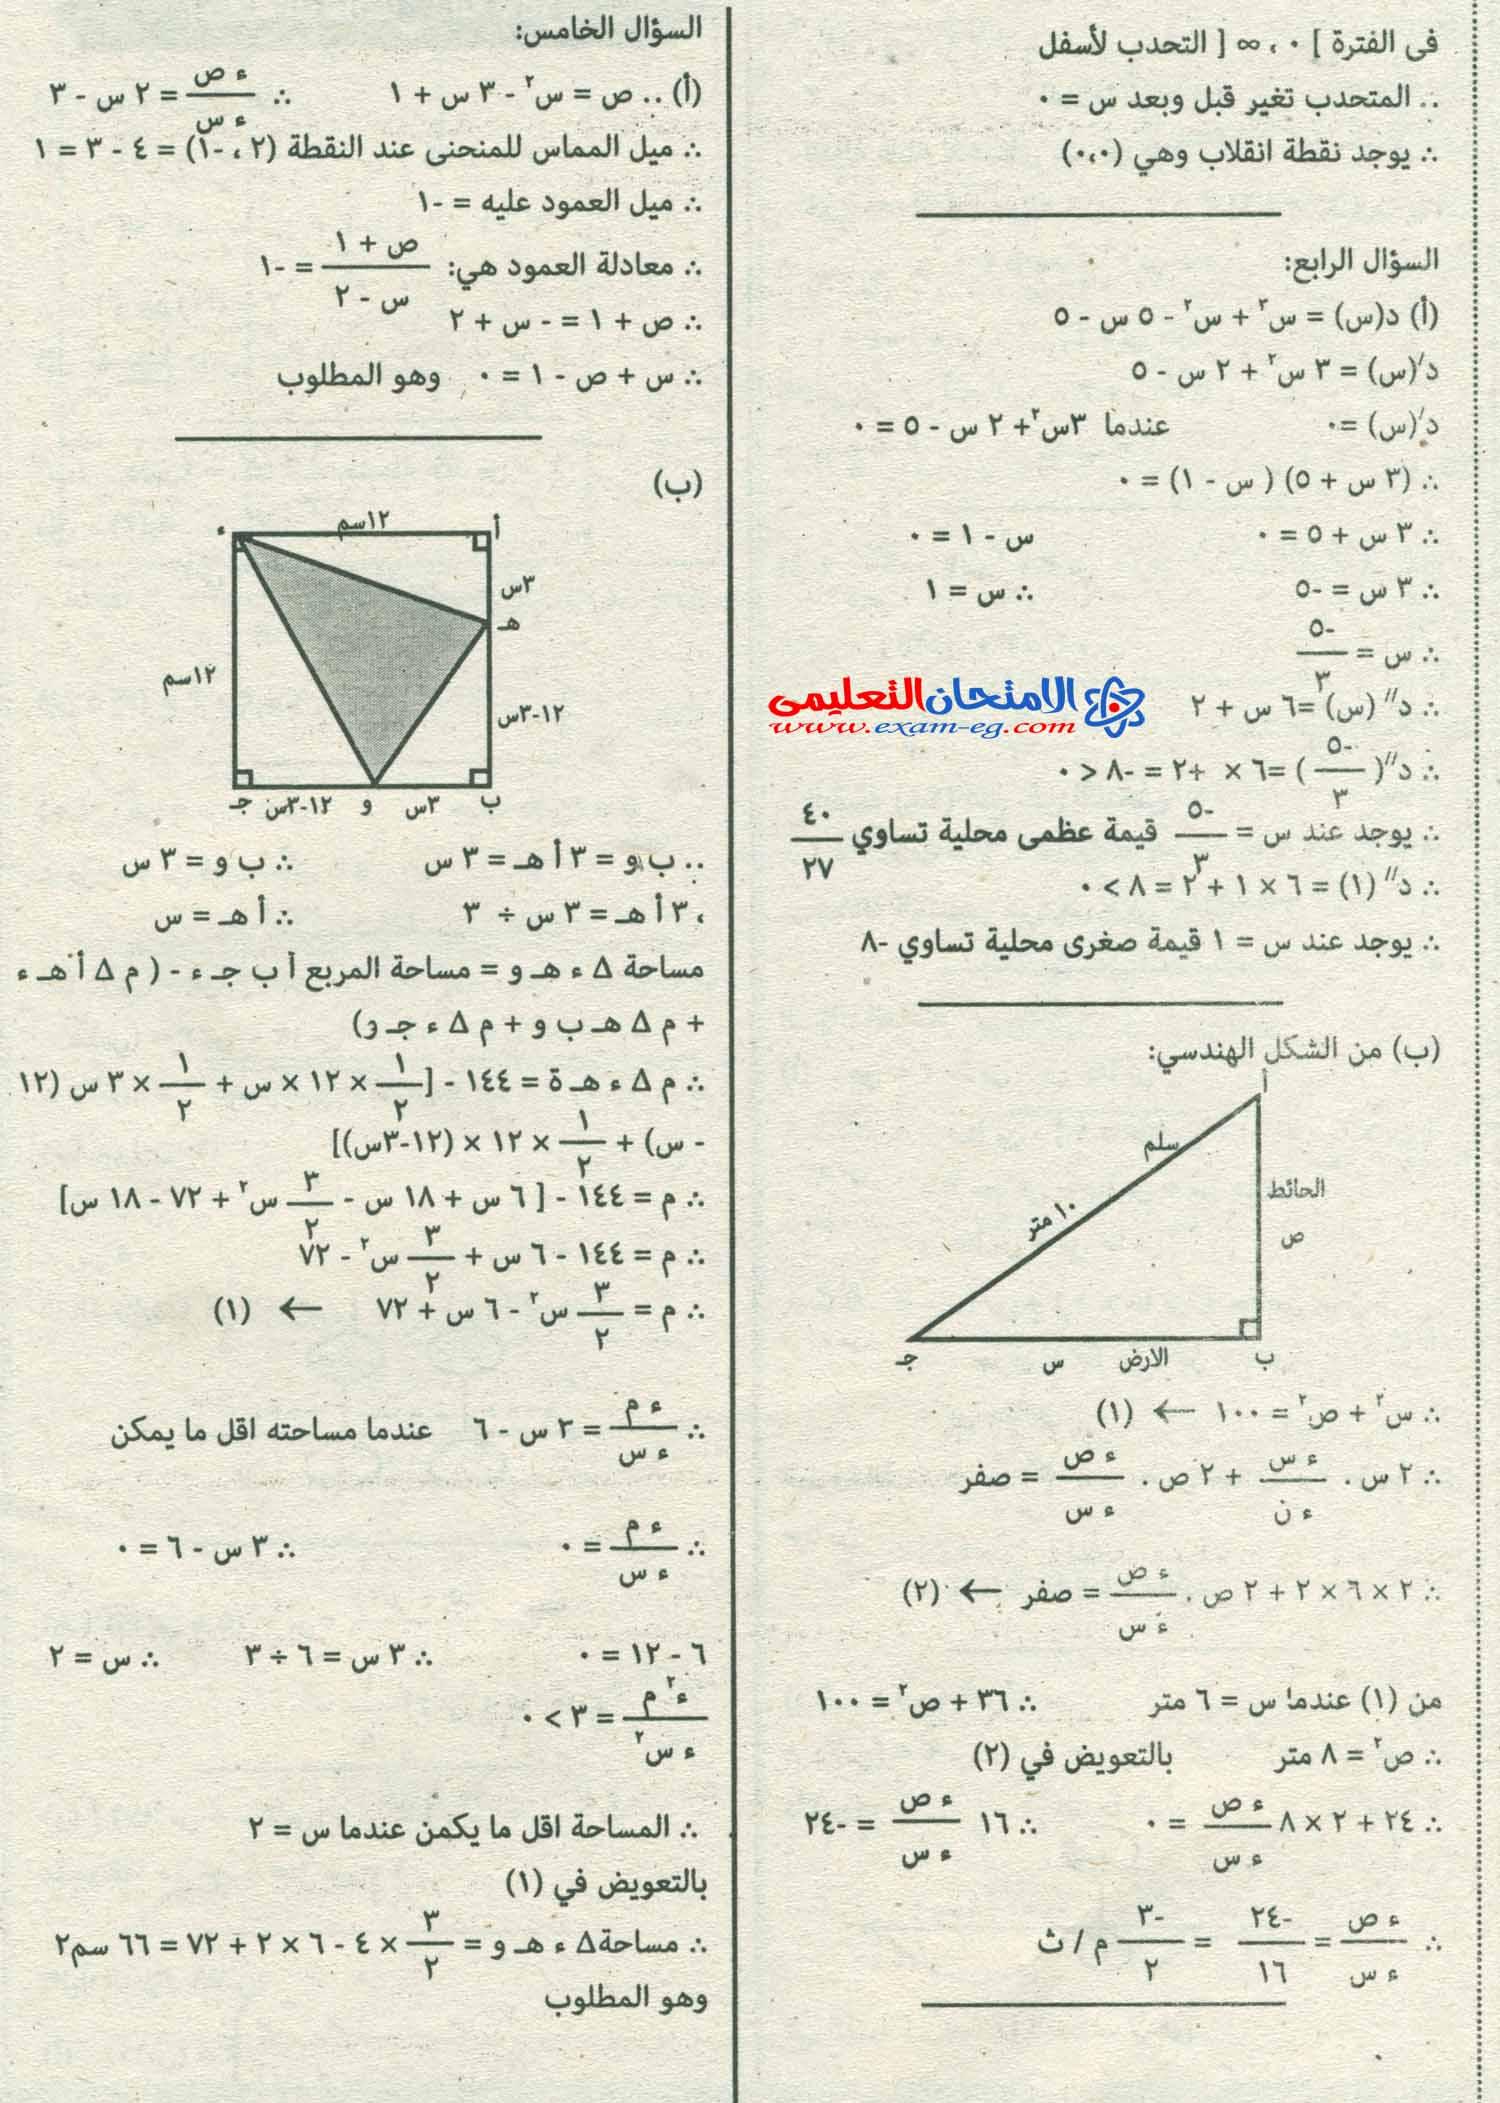 exam-eg.com_1461100089784.jpg